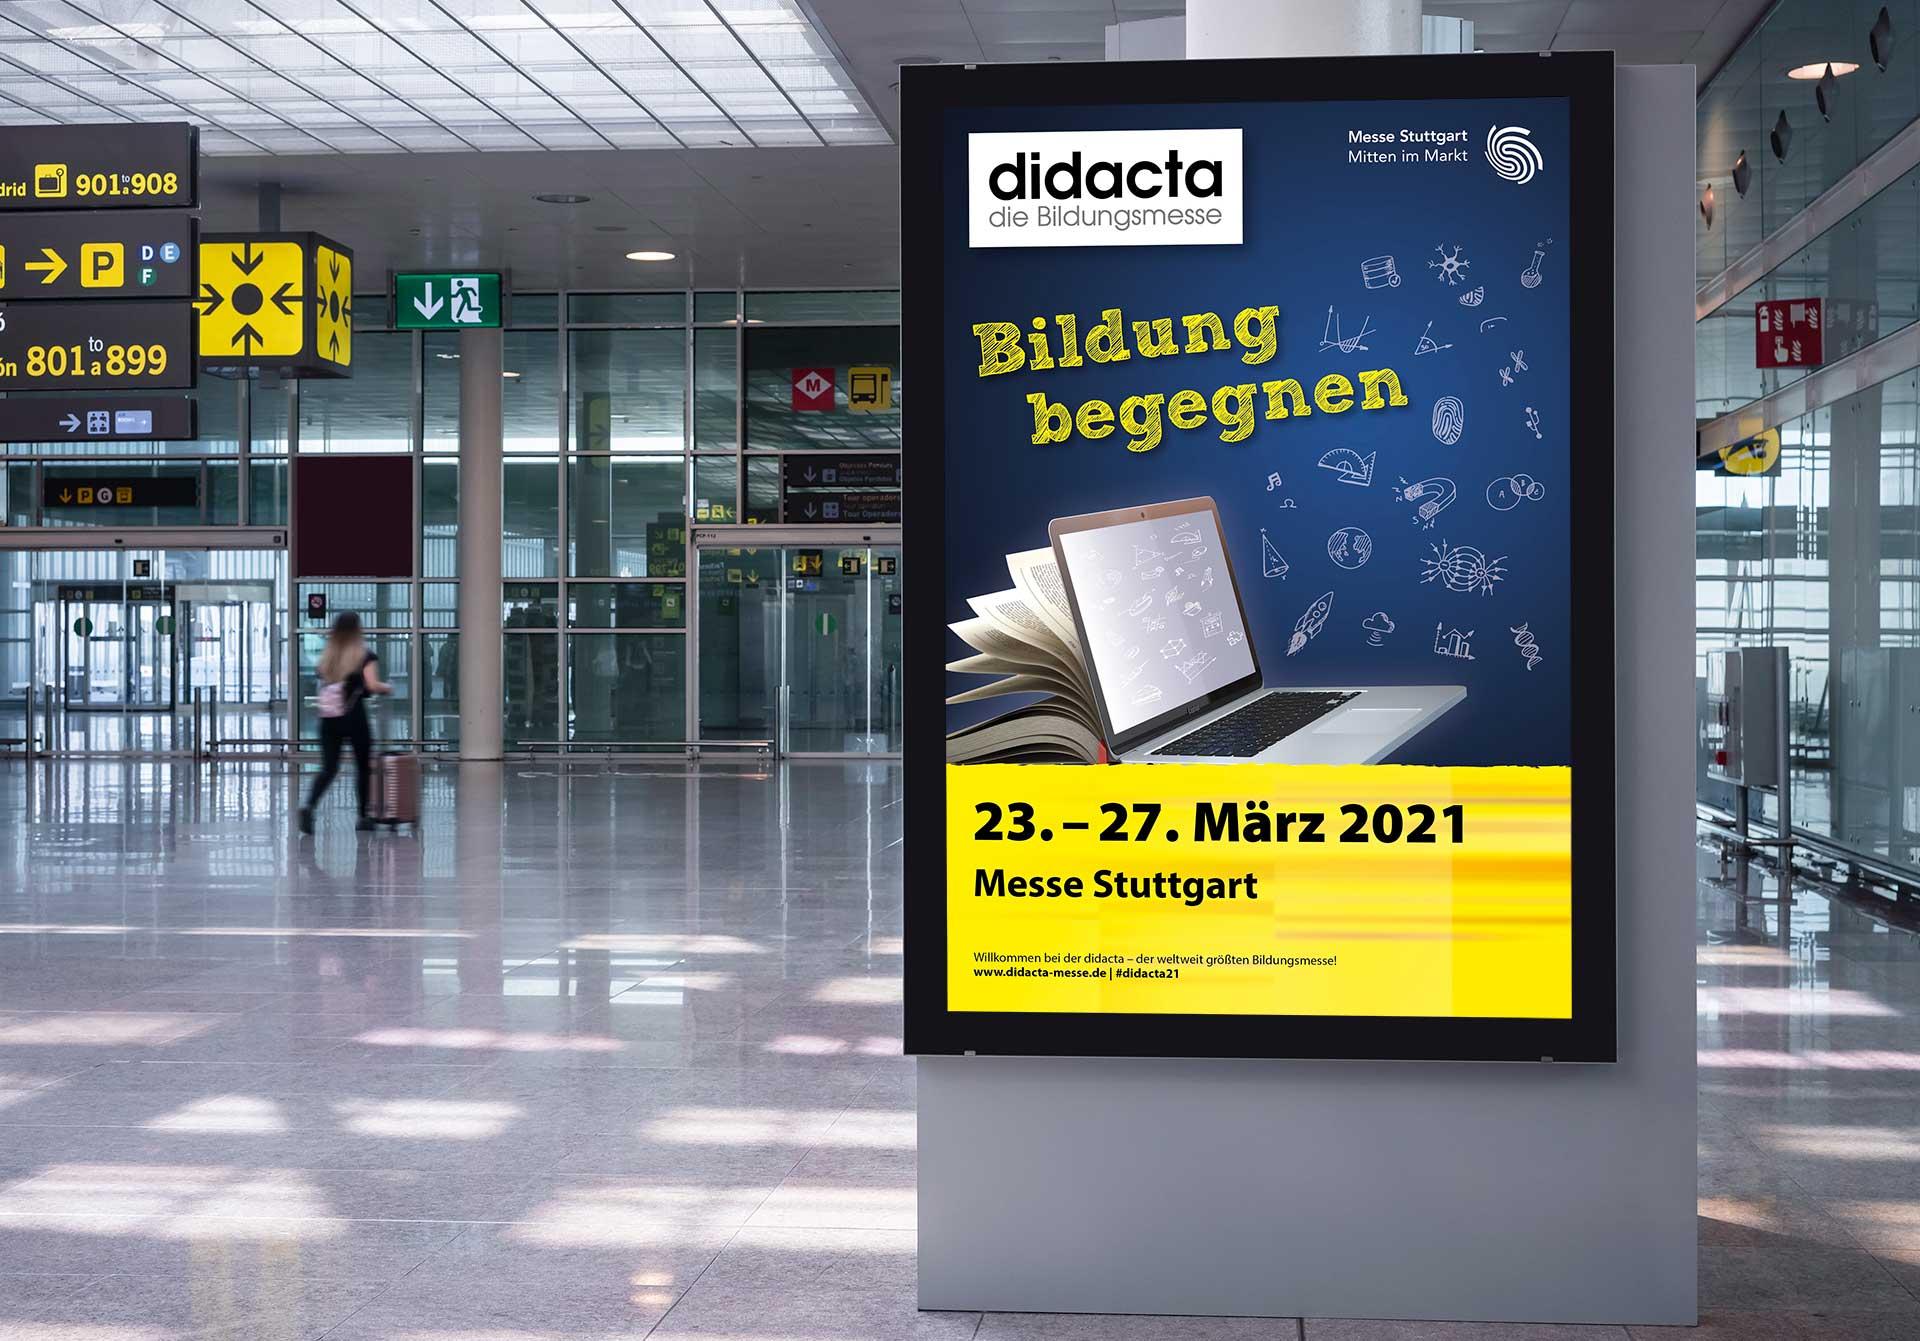 LMS_DID_2021_Flughafen_Citylight